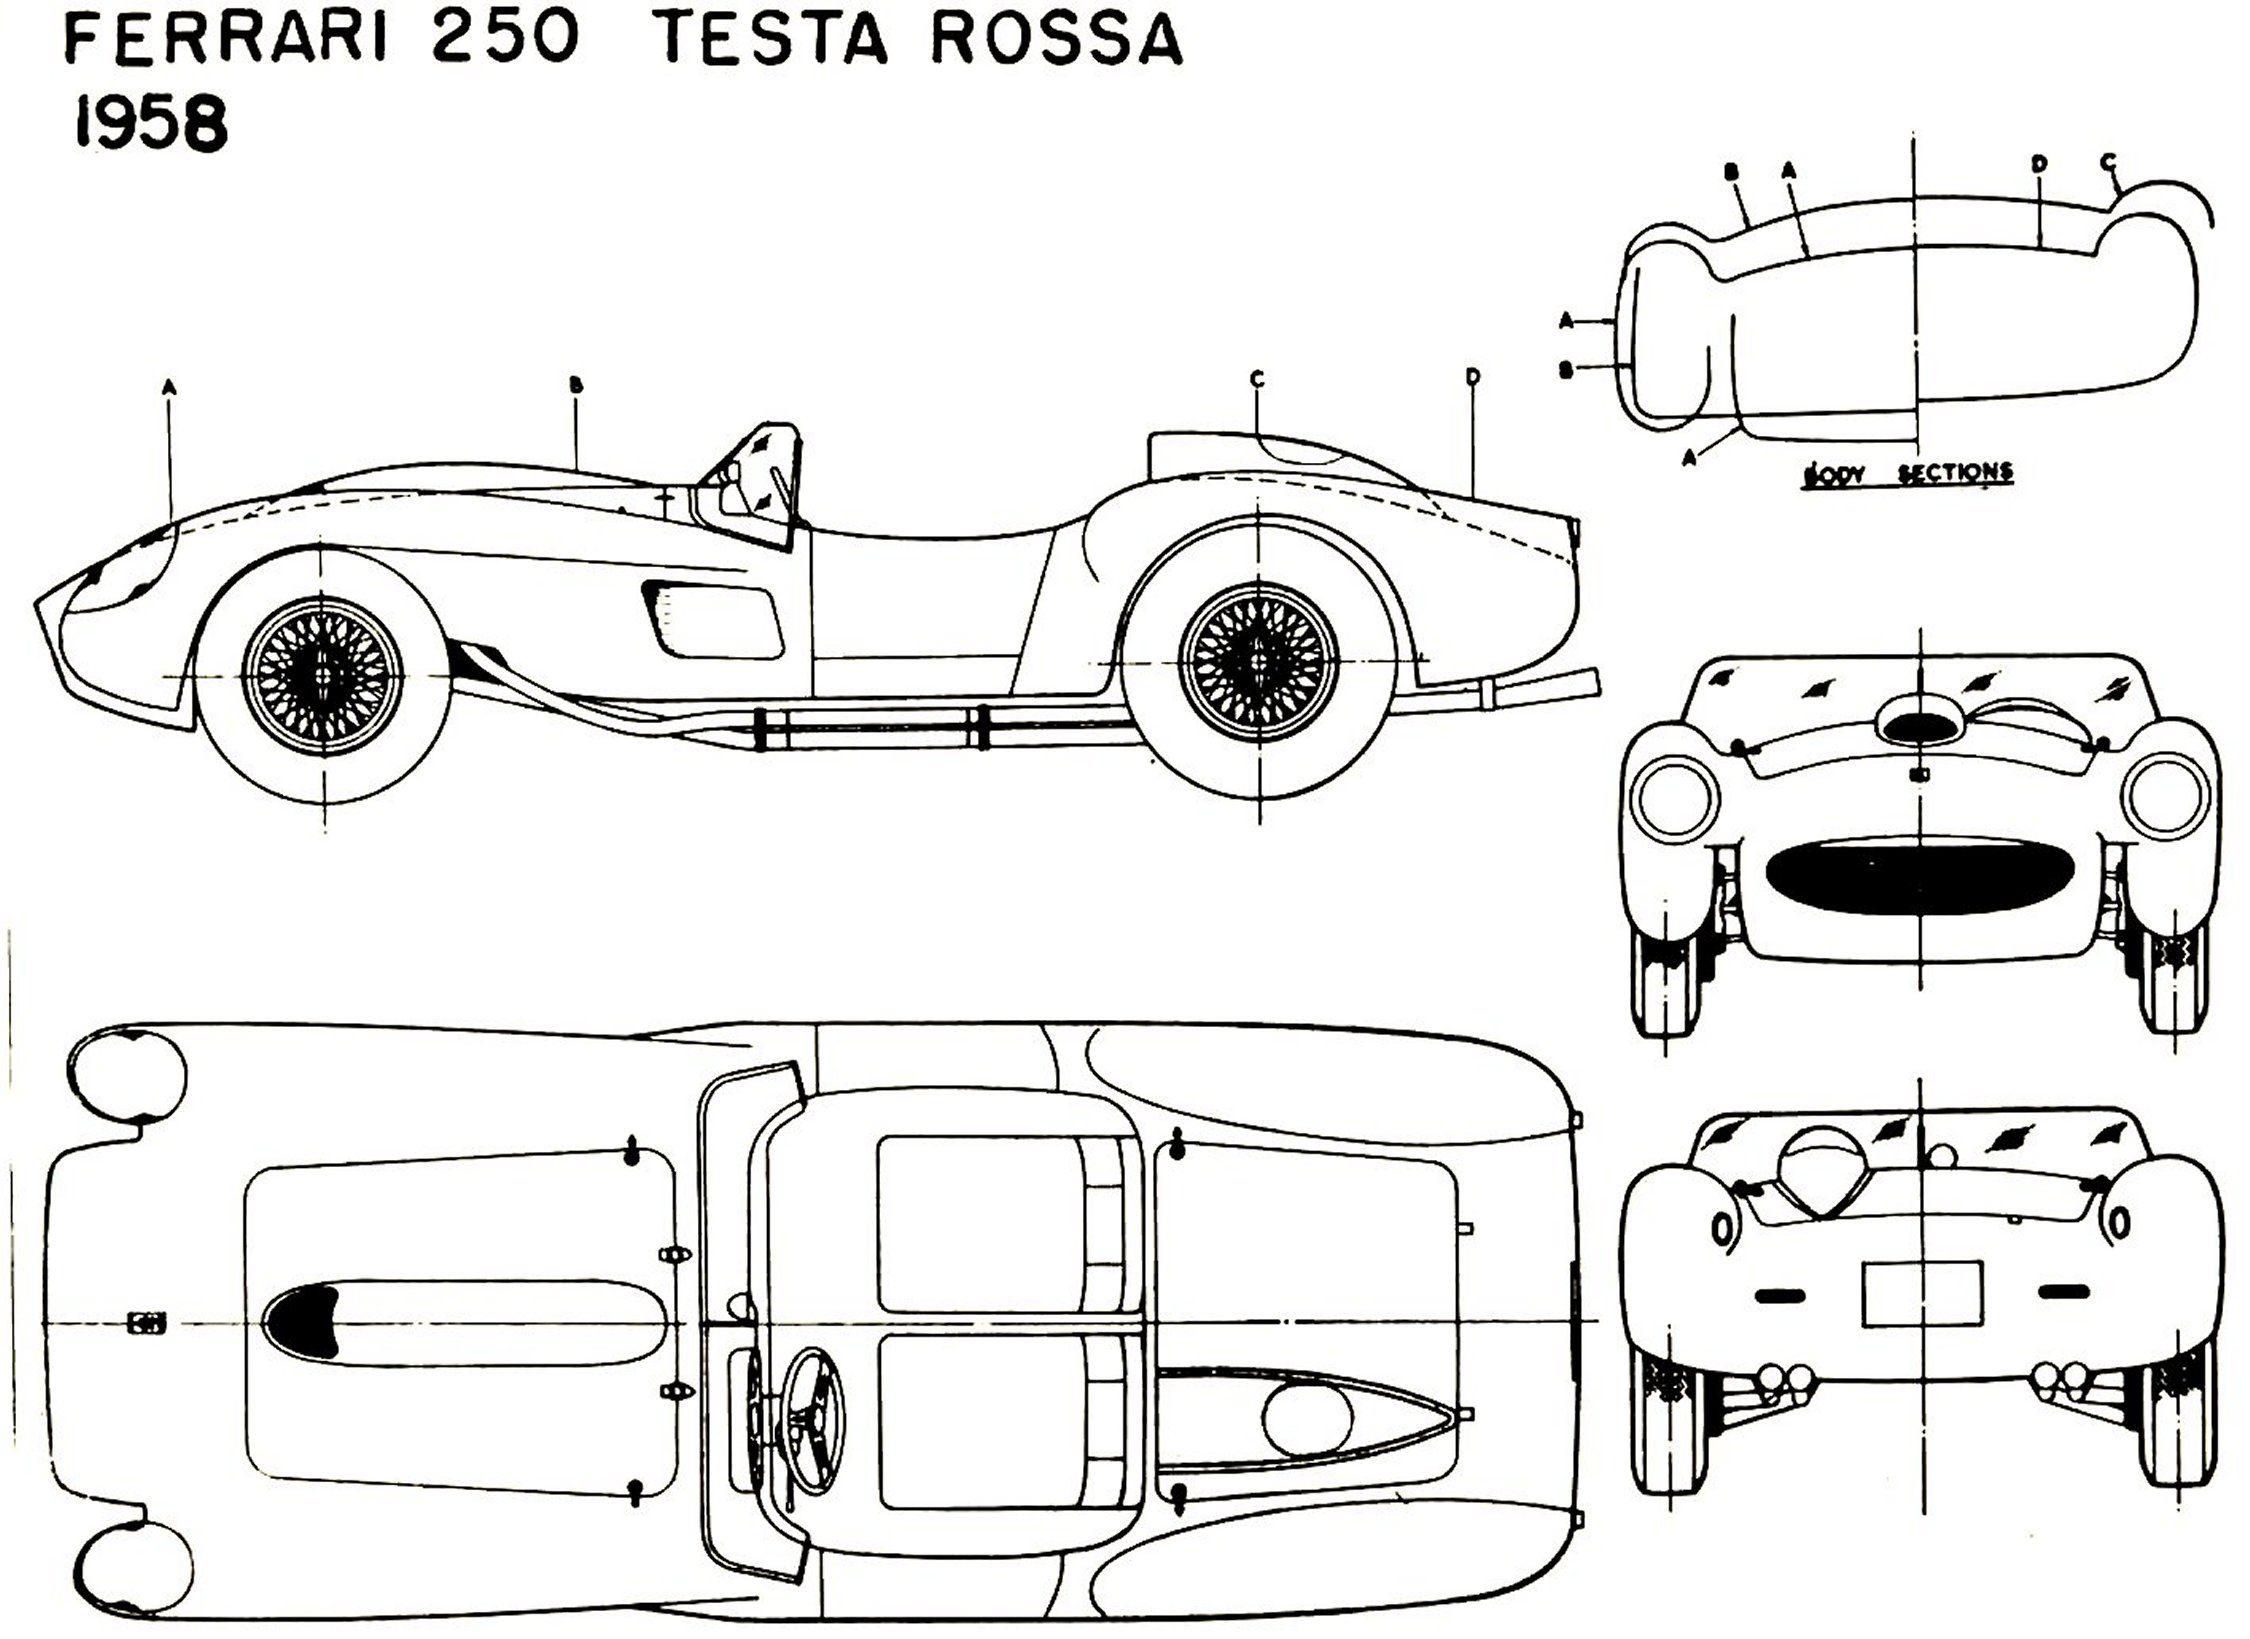 Ferrari 250 testarossa blueprint cars pinterest ferrari le cars ferrari 250 testarossa blueprint malvernweather Choice Image